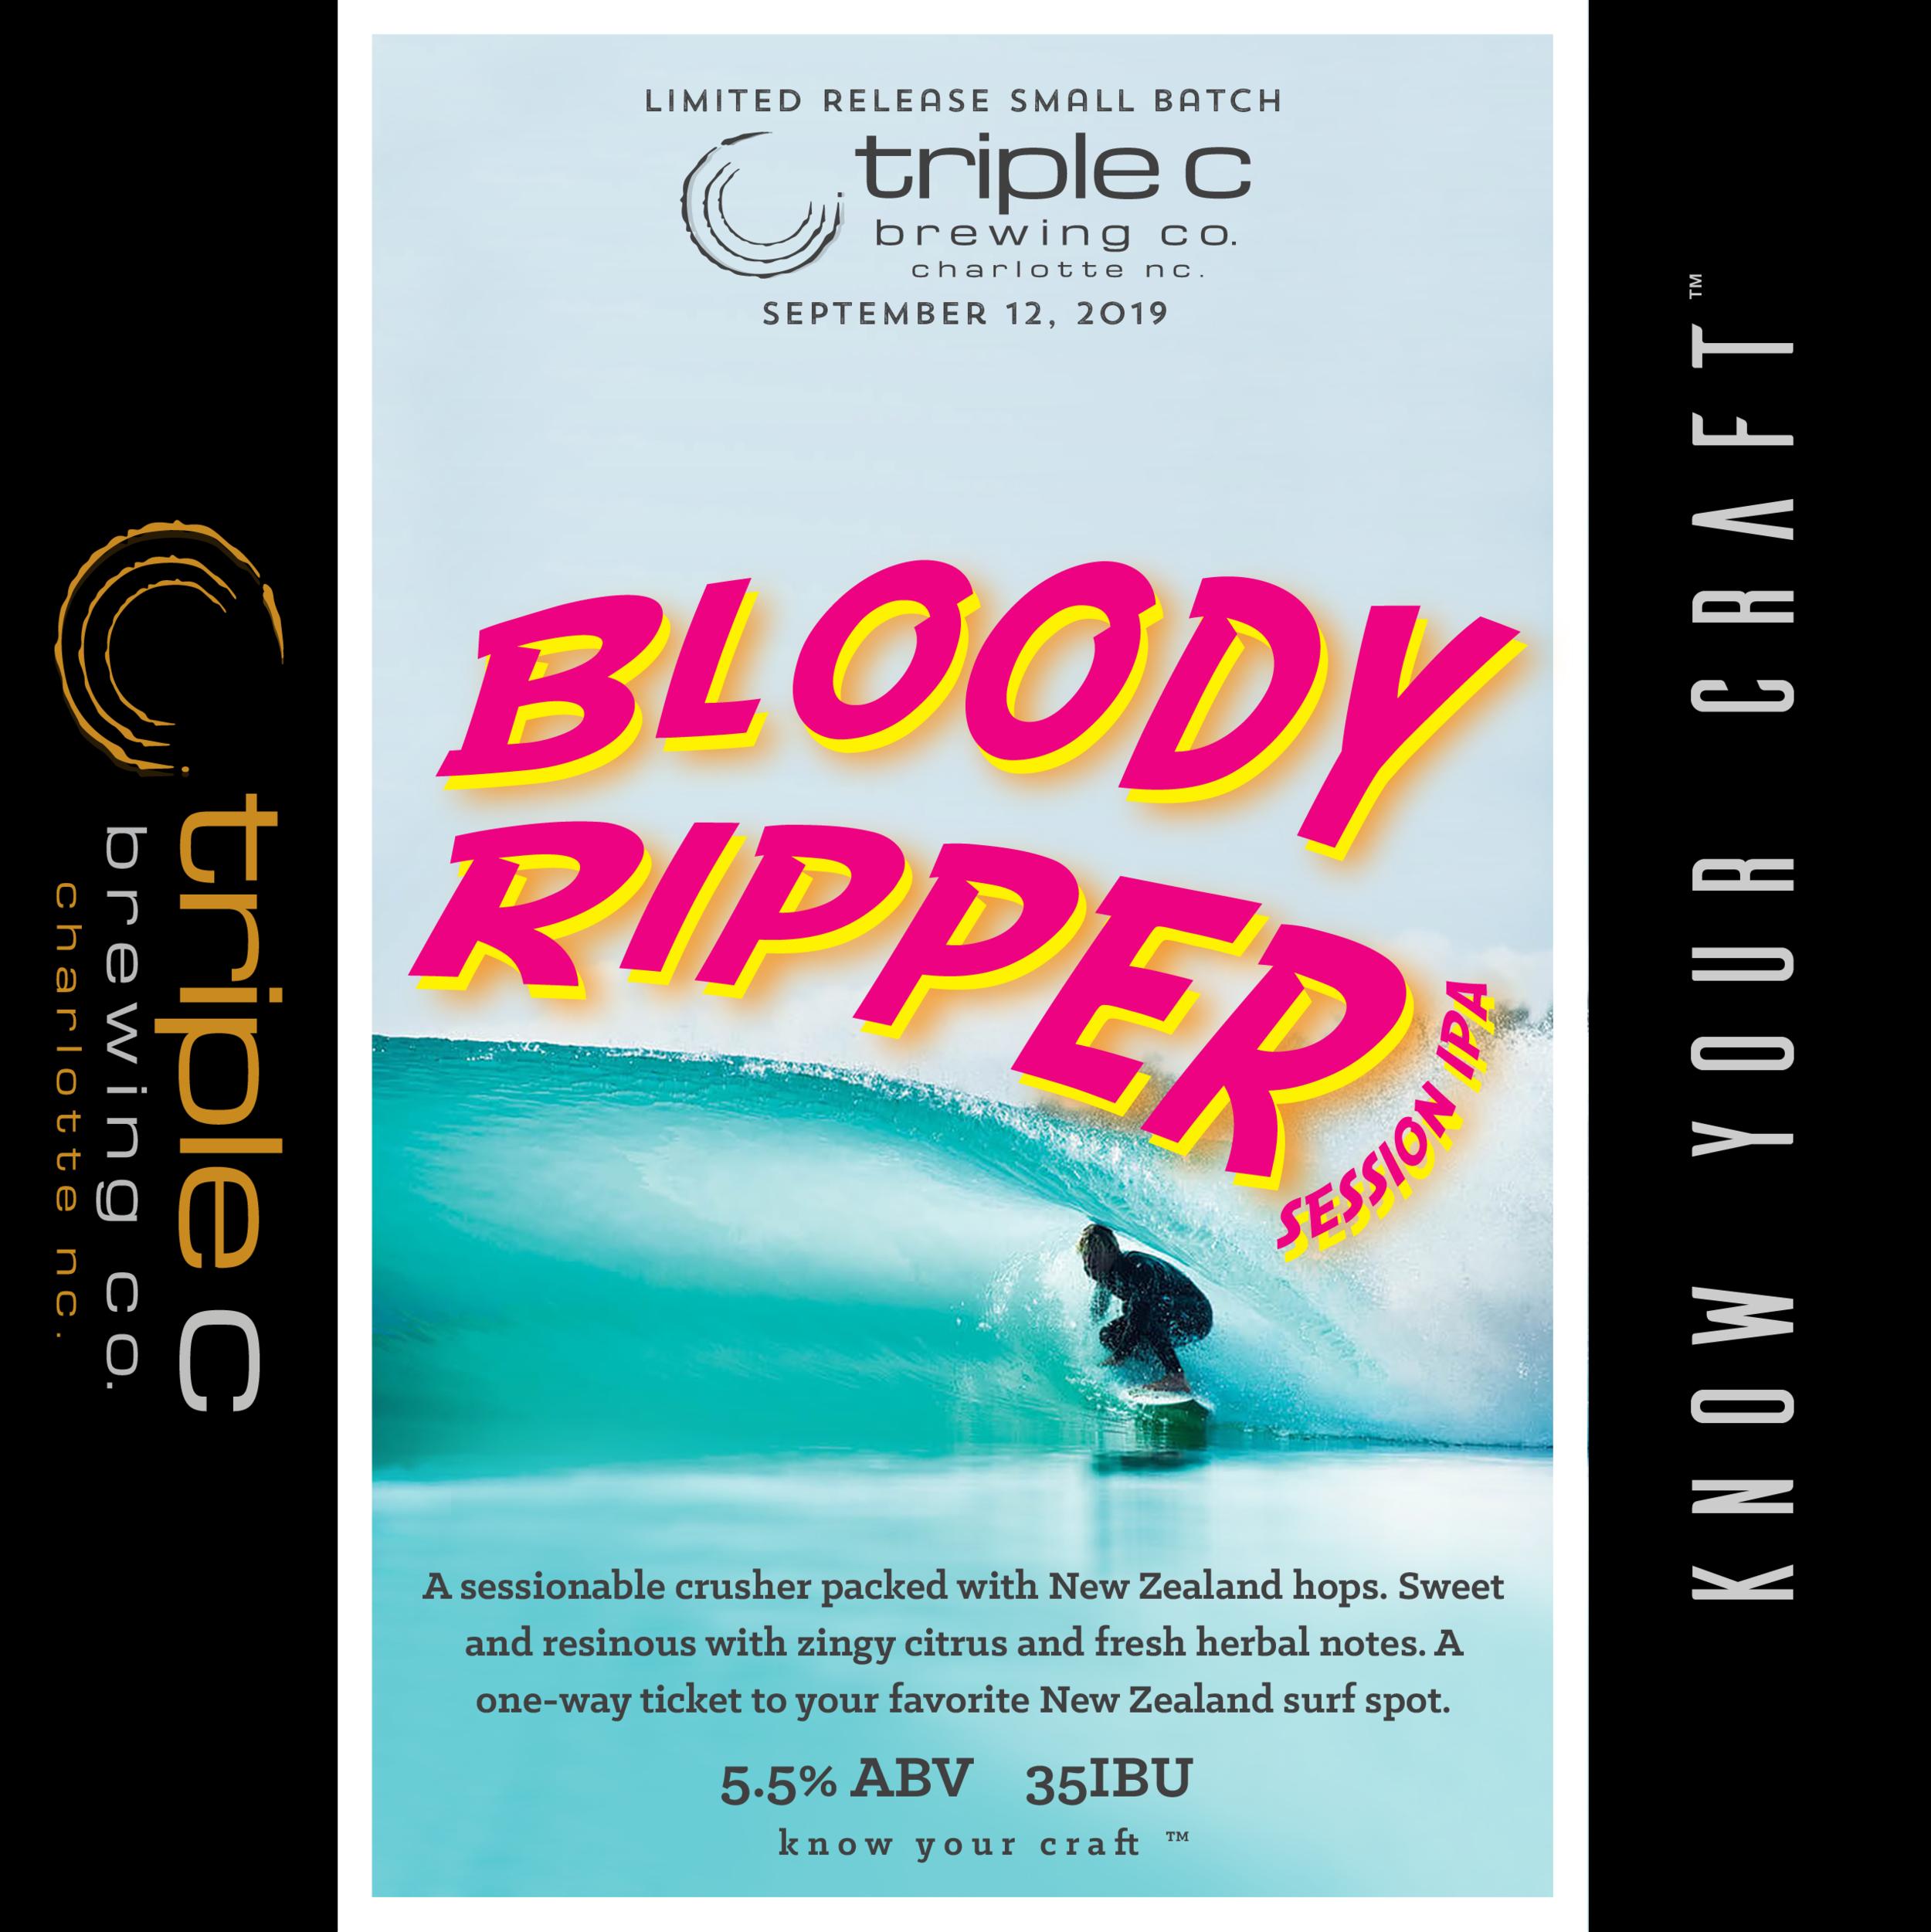 BloodyRipper_Media2.png